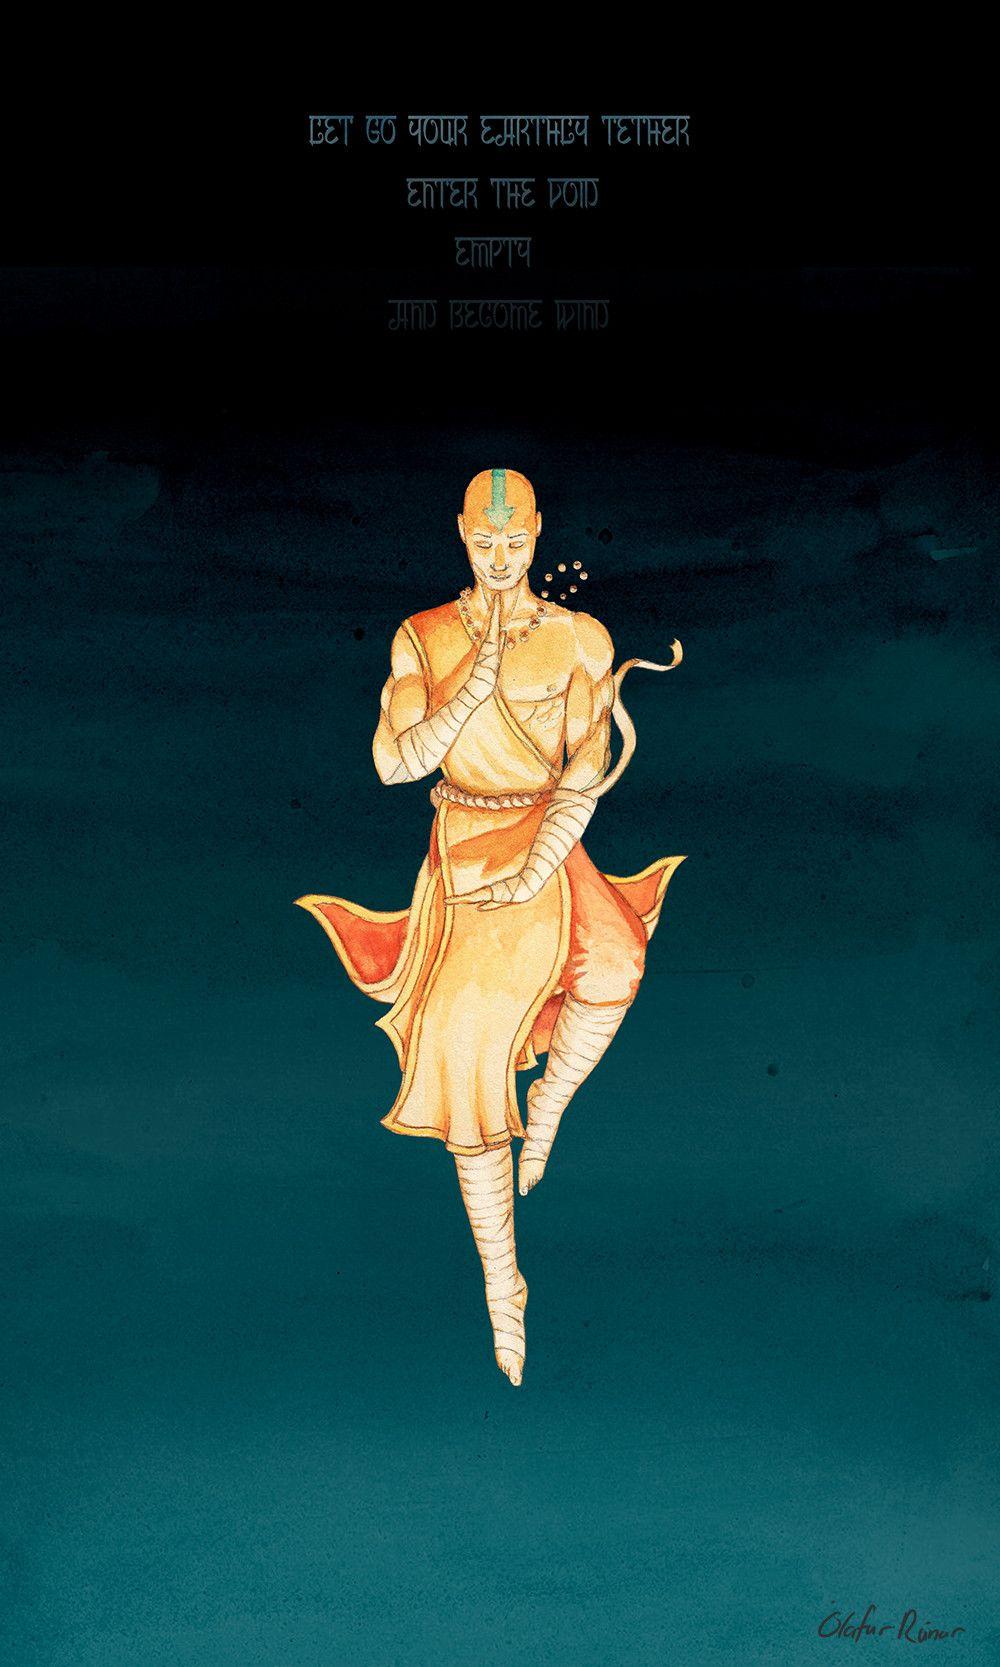 guru laghima avatar aang avatar world avatar the last airbender